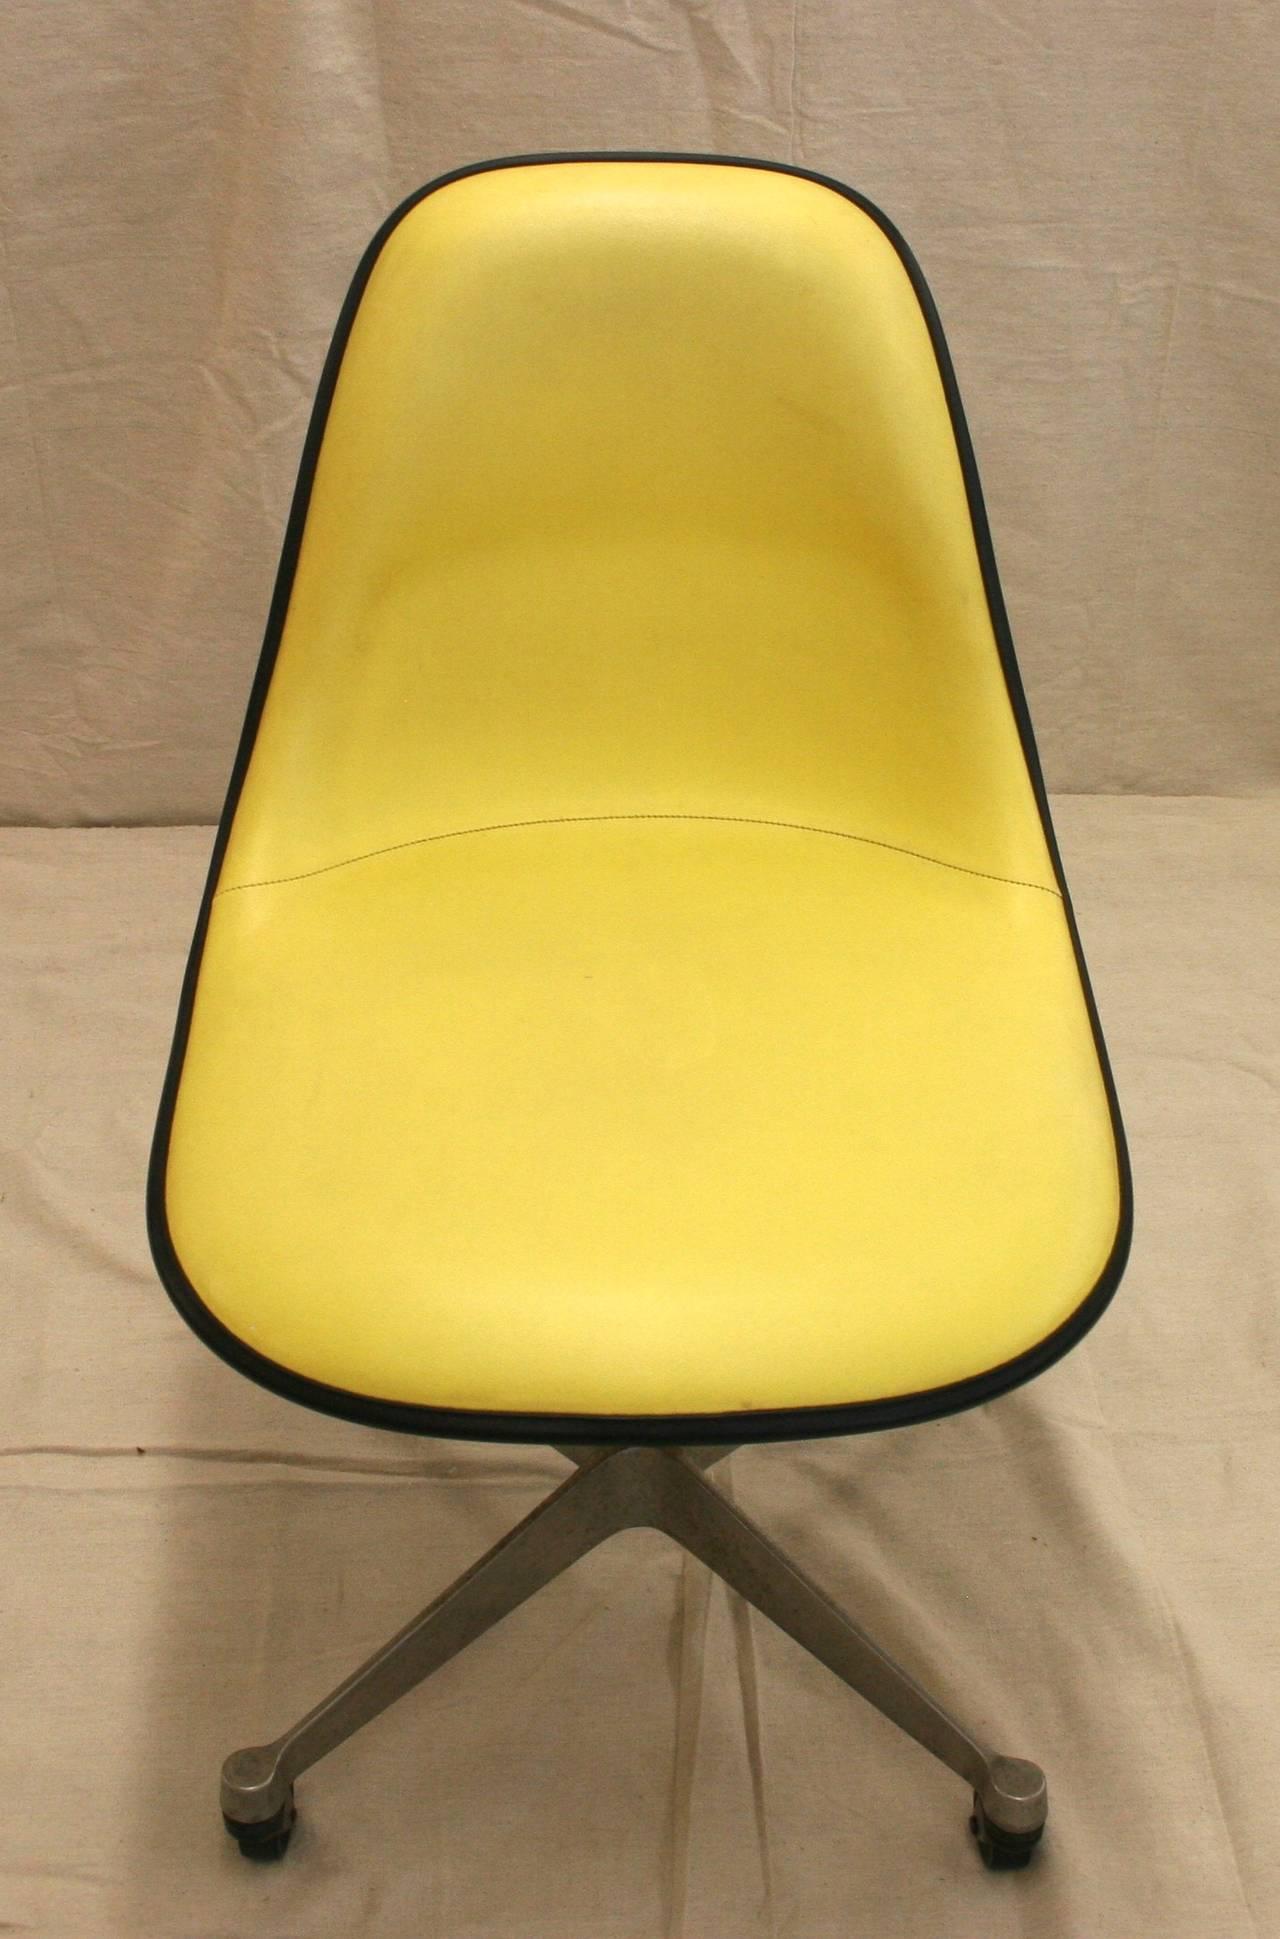 Painted wooden high chair - Midcentury Herman Miller Fiberglass Shell Chair 2